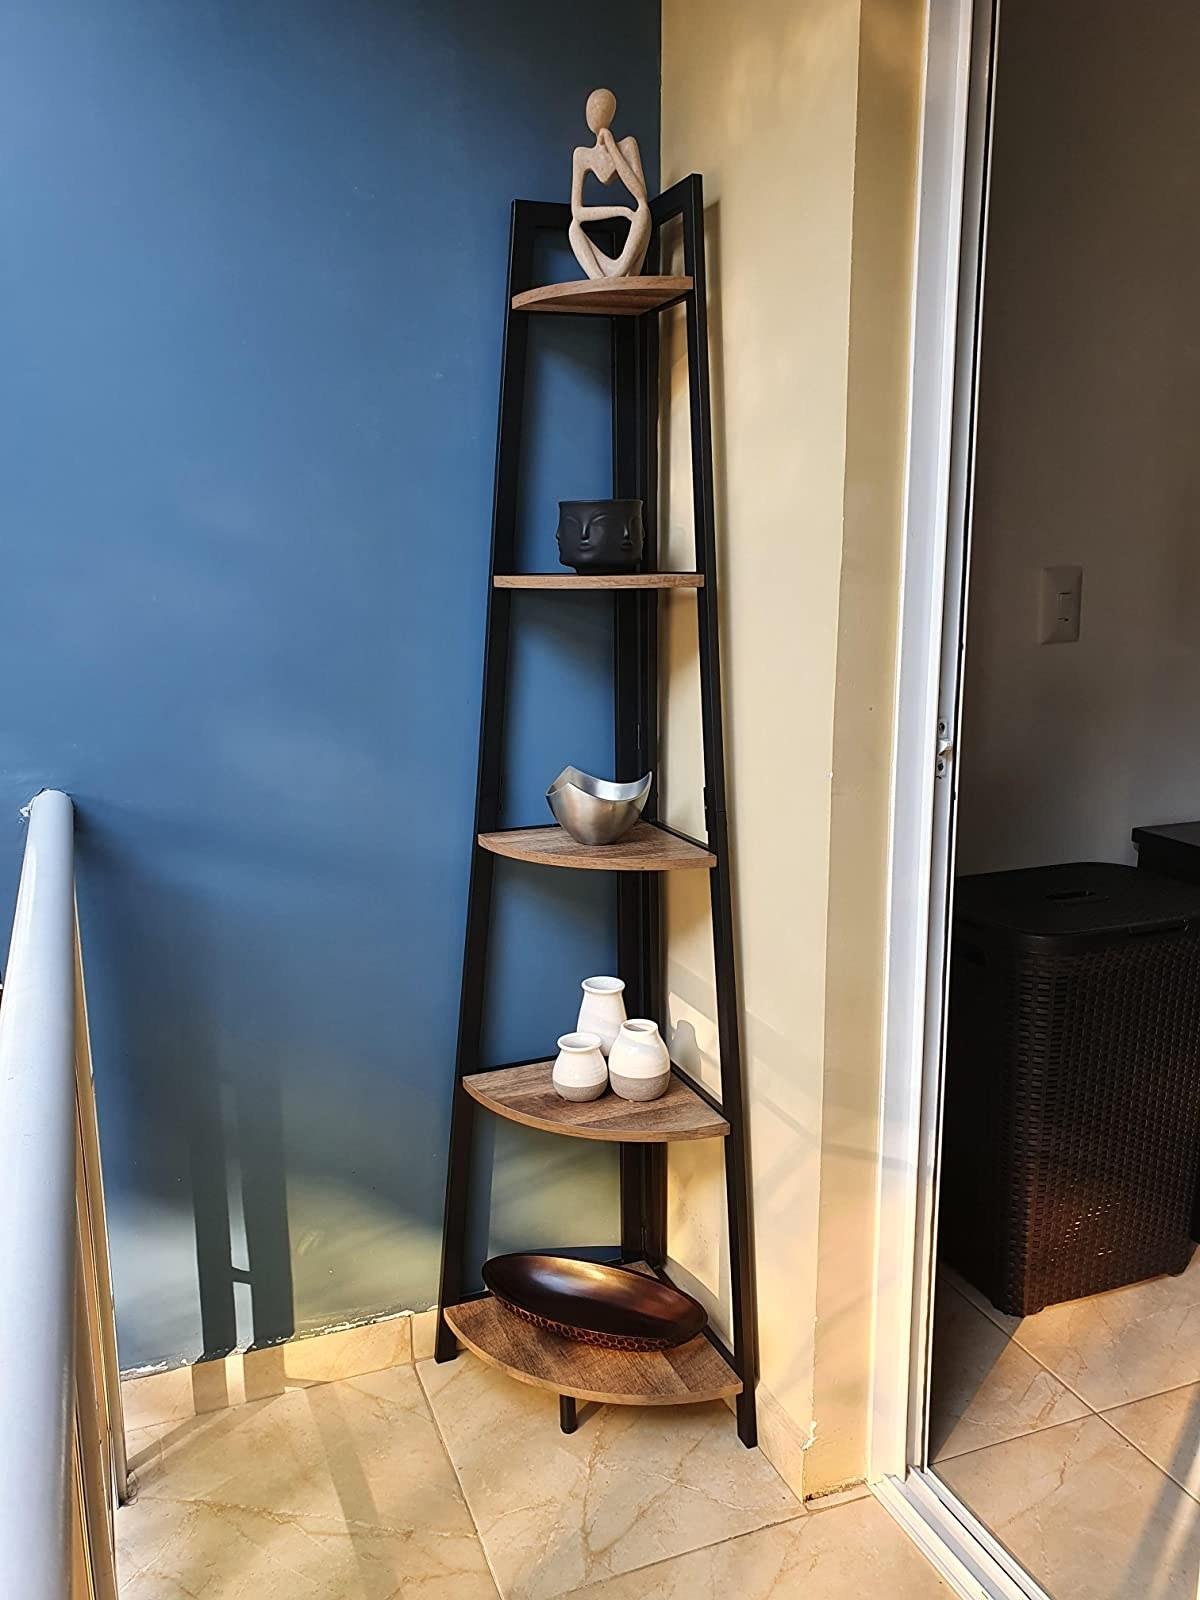 The pyramid-shaped bookshelf in a corner